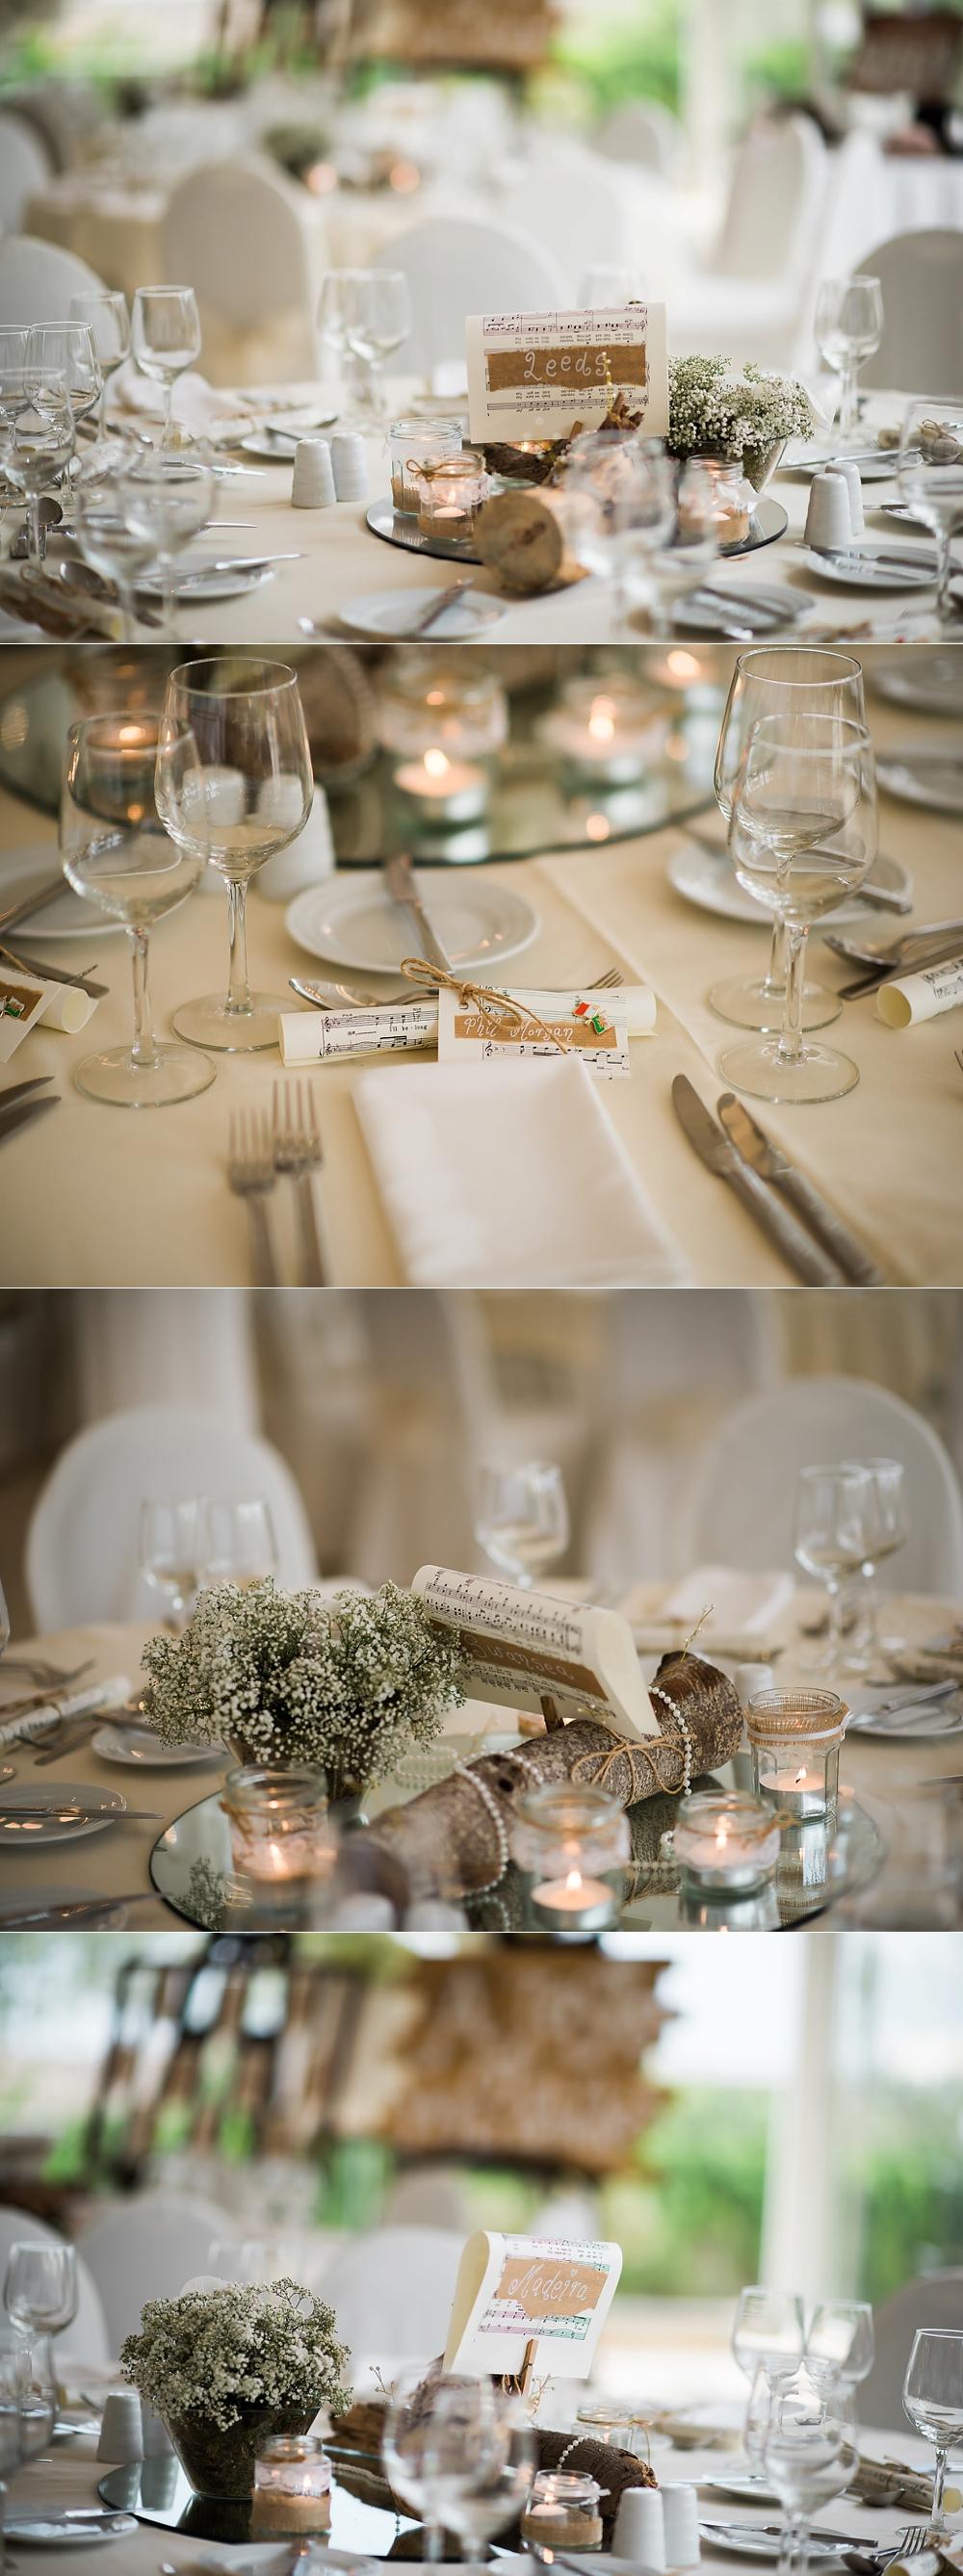 Hollie & Michael - Wedding in Villa Arrigo - Shane P. Watts Photography